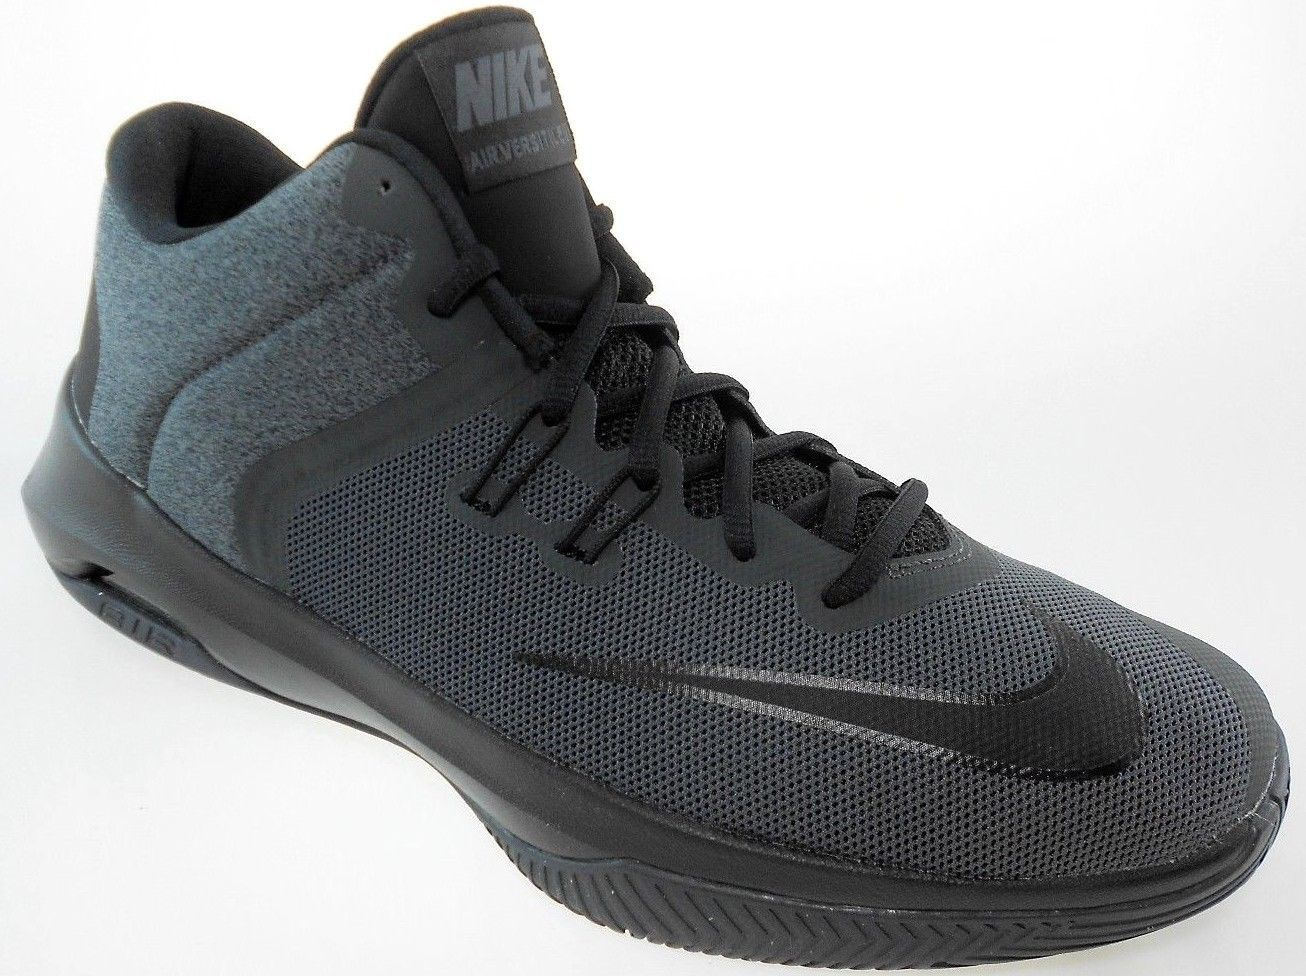 685ee44a2e40 Nike Air Versitile Ii Nbk Men s and 50 similar items. S l1600